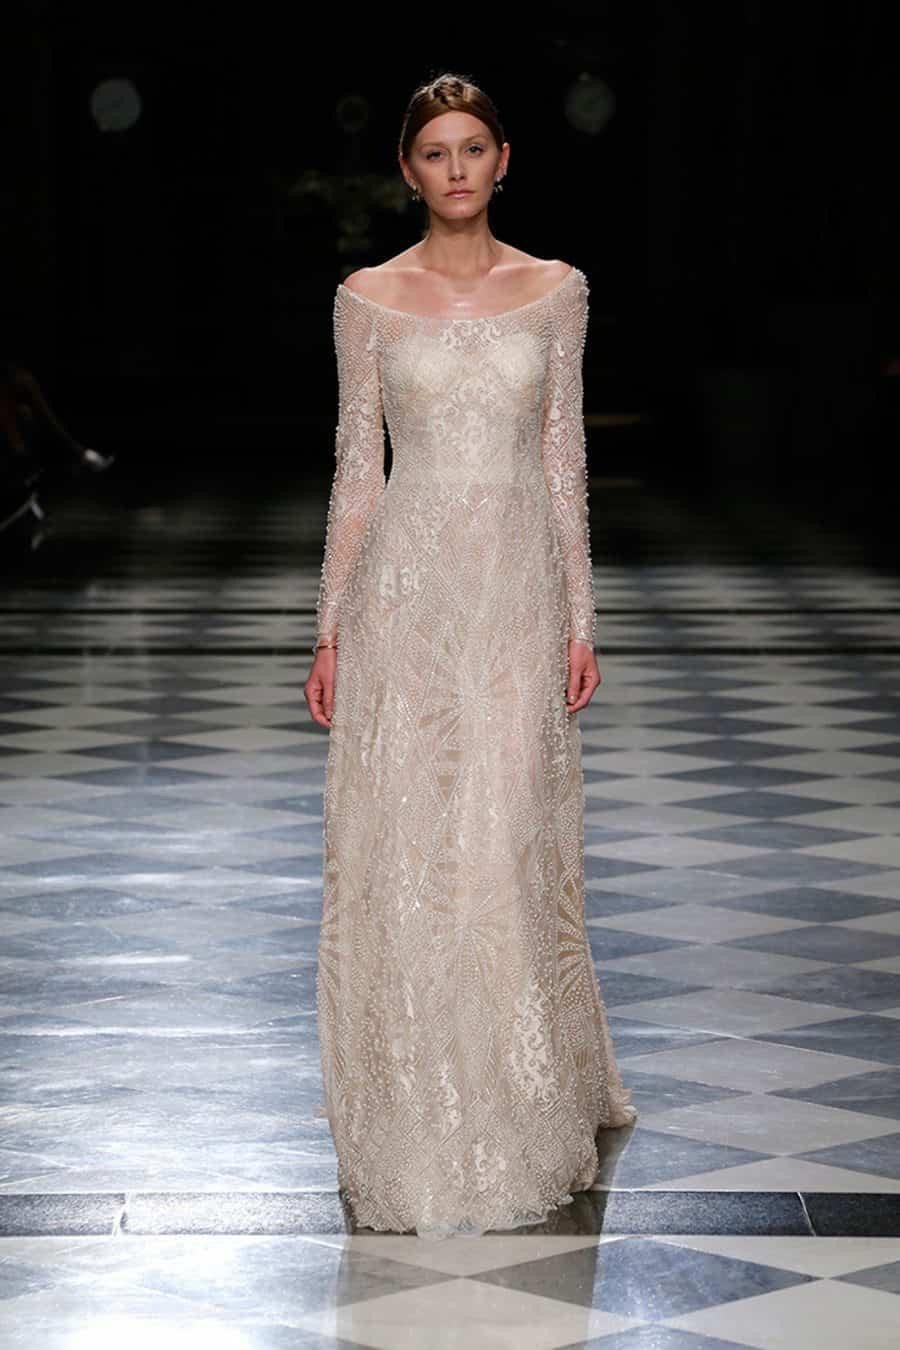 bride-high-fashion-couture-weddingdress-wedding-bridedress-couturedress-highfashion-yolancris-73